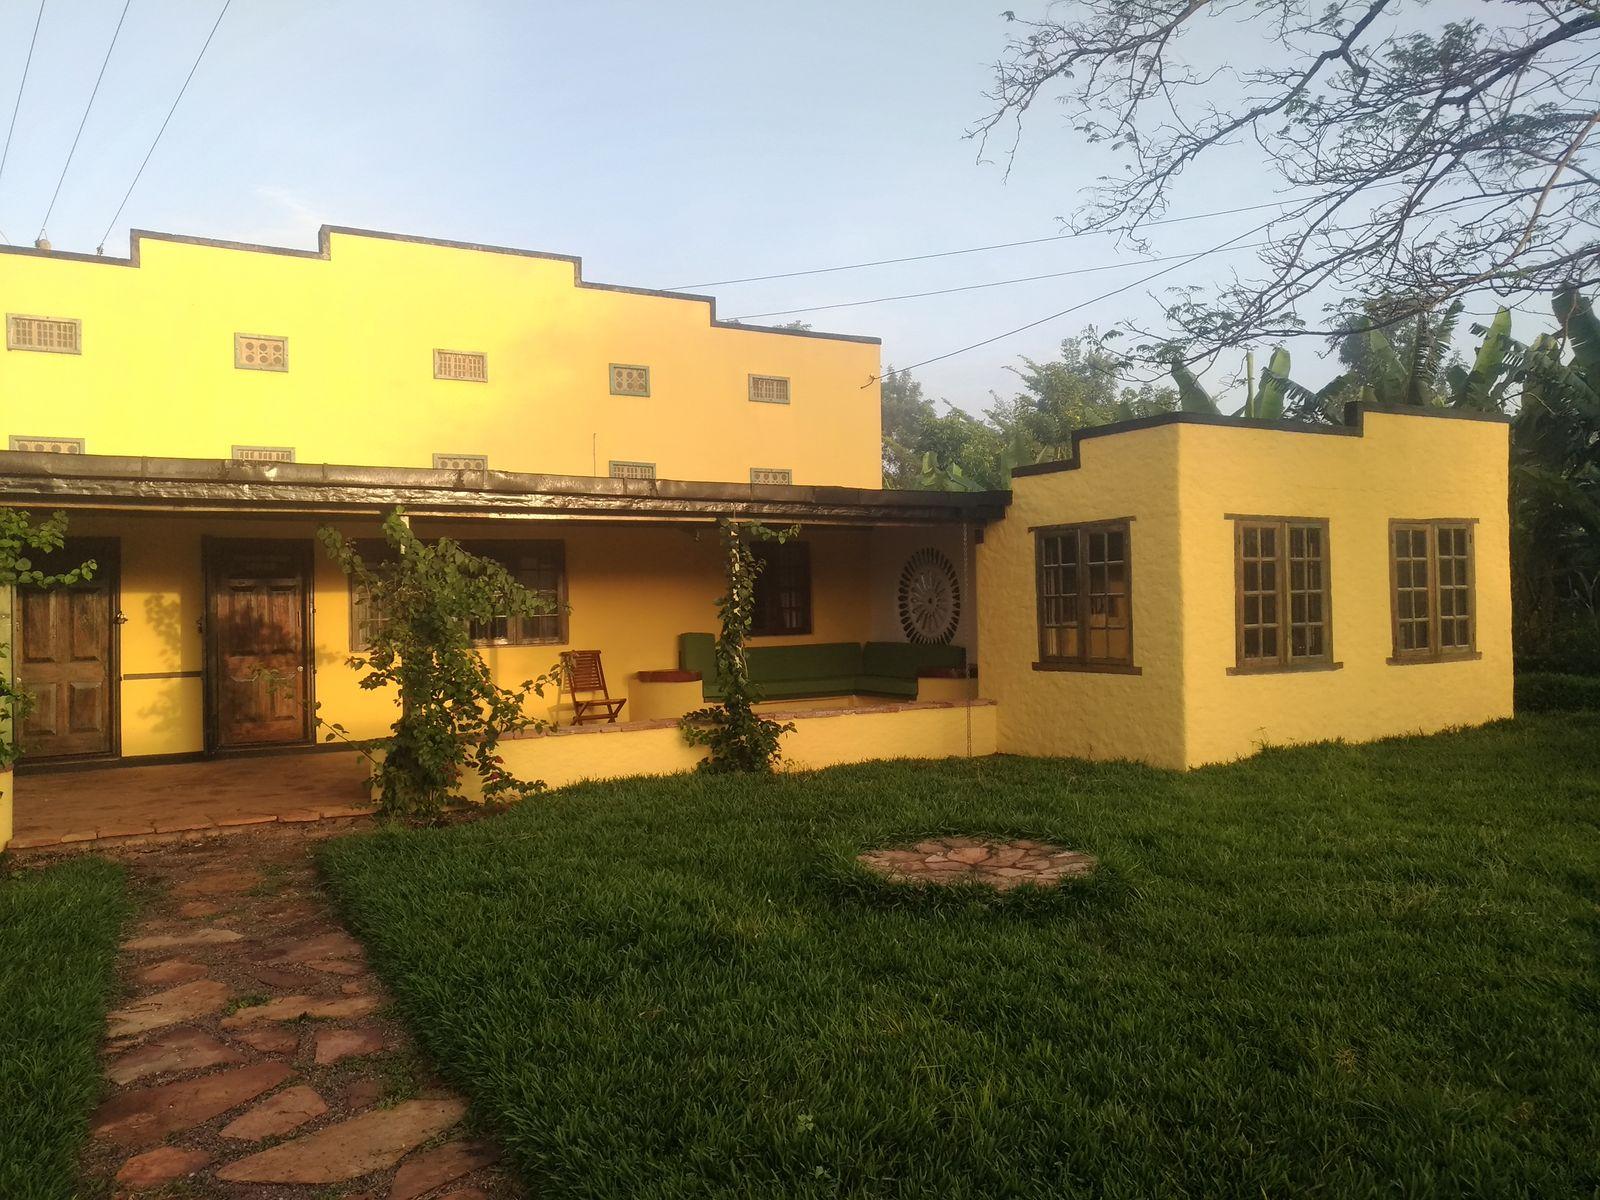 Clemens Fehr / Vanillehaendler aus Uganda